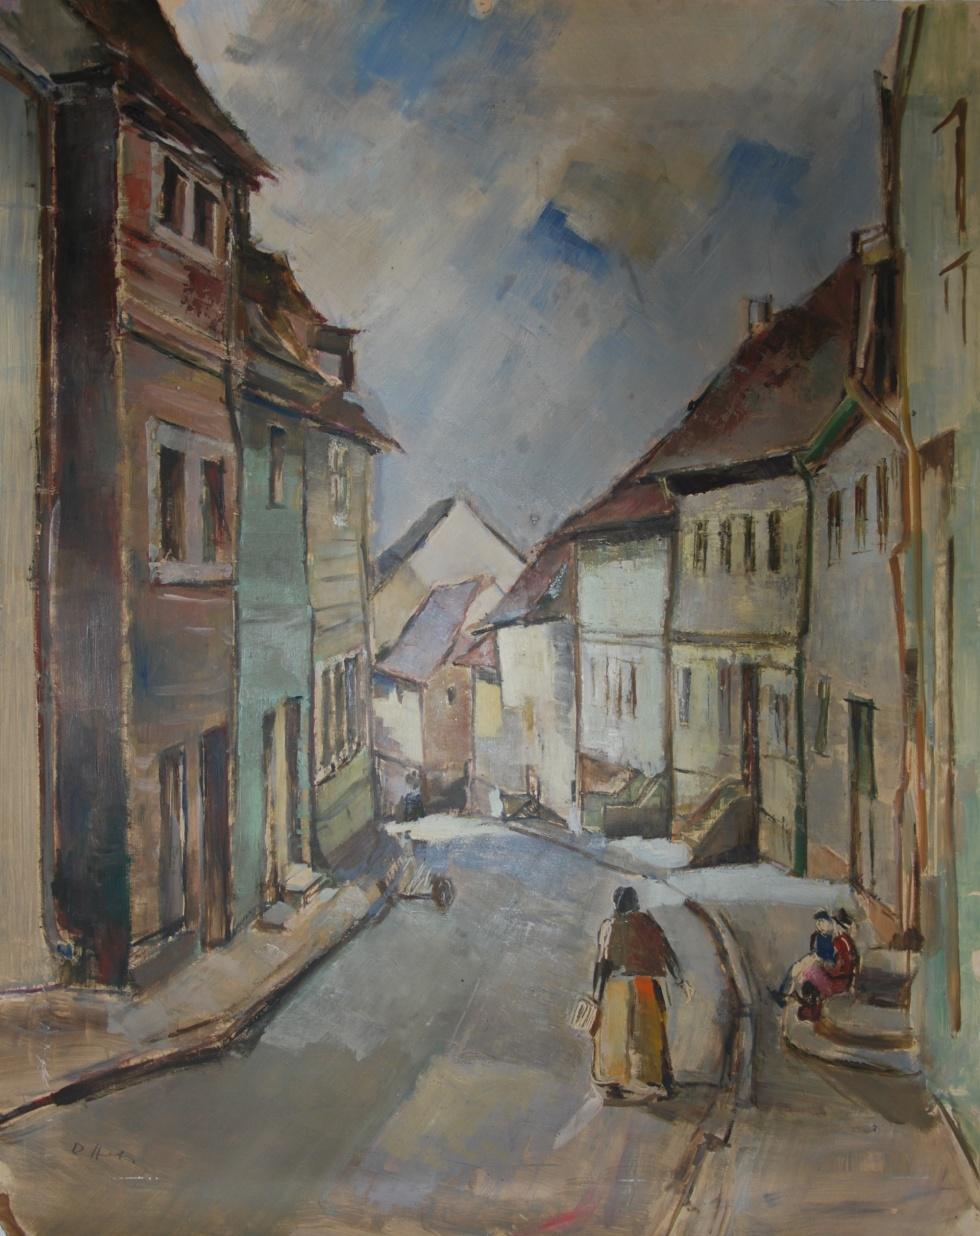 Zeitz singles Holiday Rentals & Apartments in Saxony-Anhalt